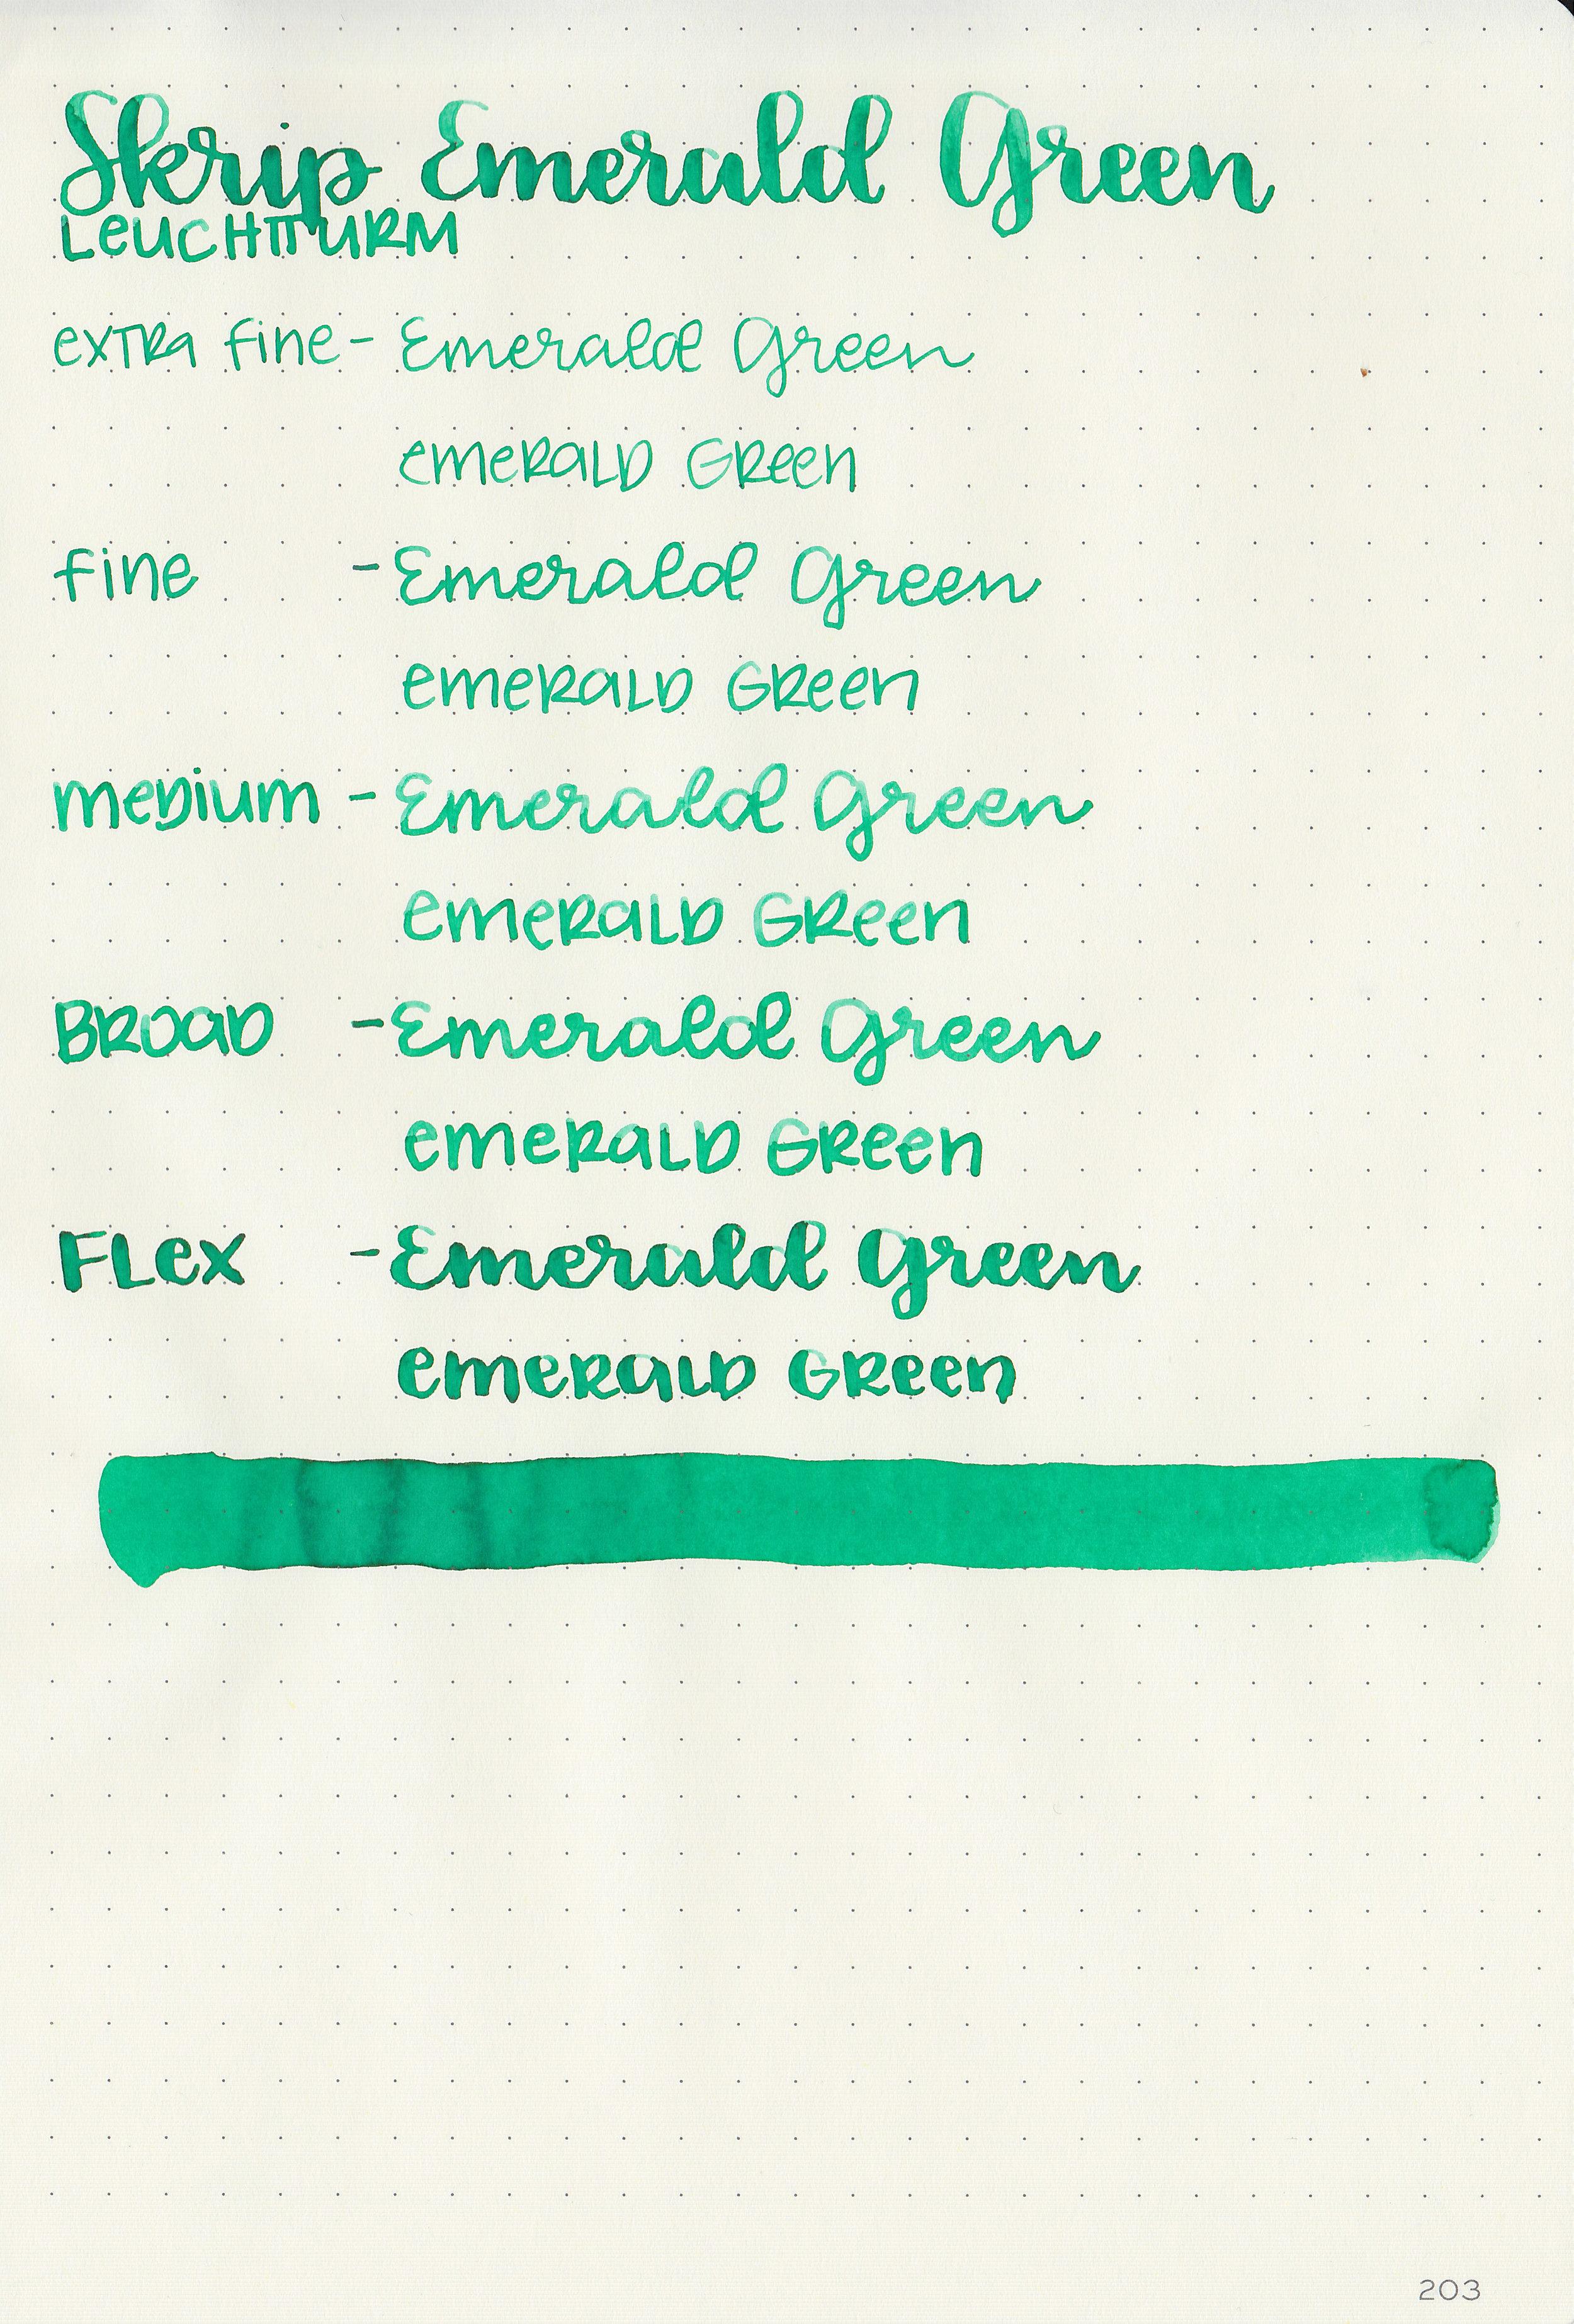 skr-emerald-green-13.jpg